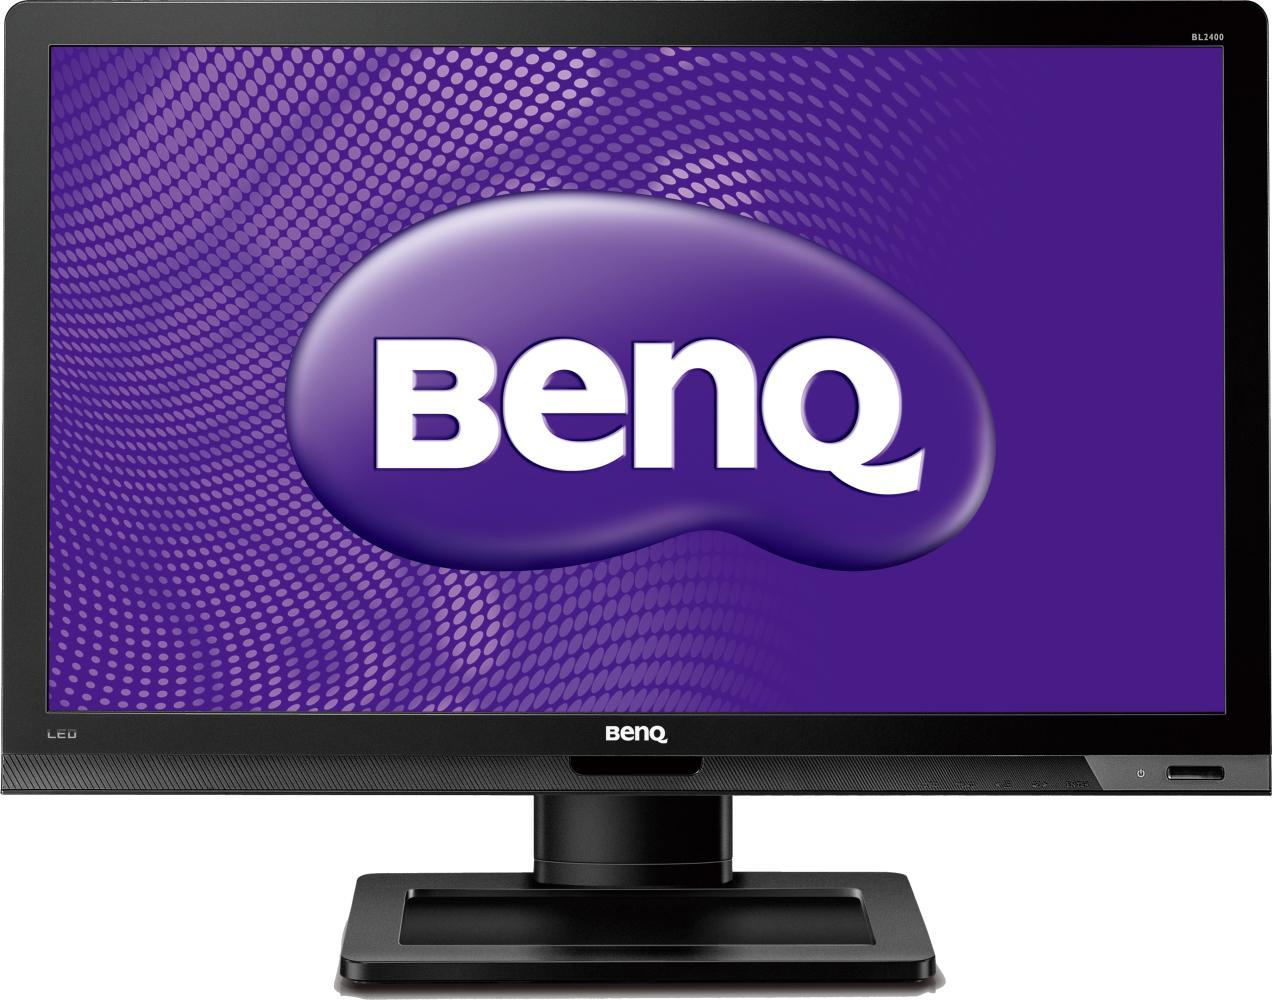 BenQ G2450HM